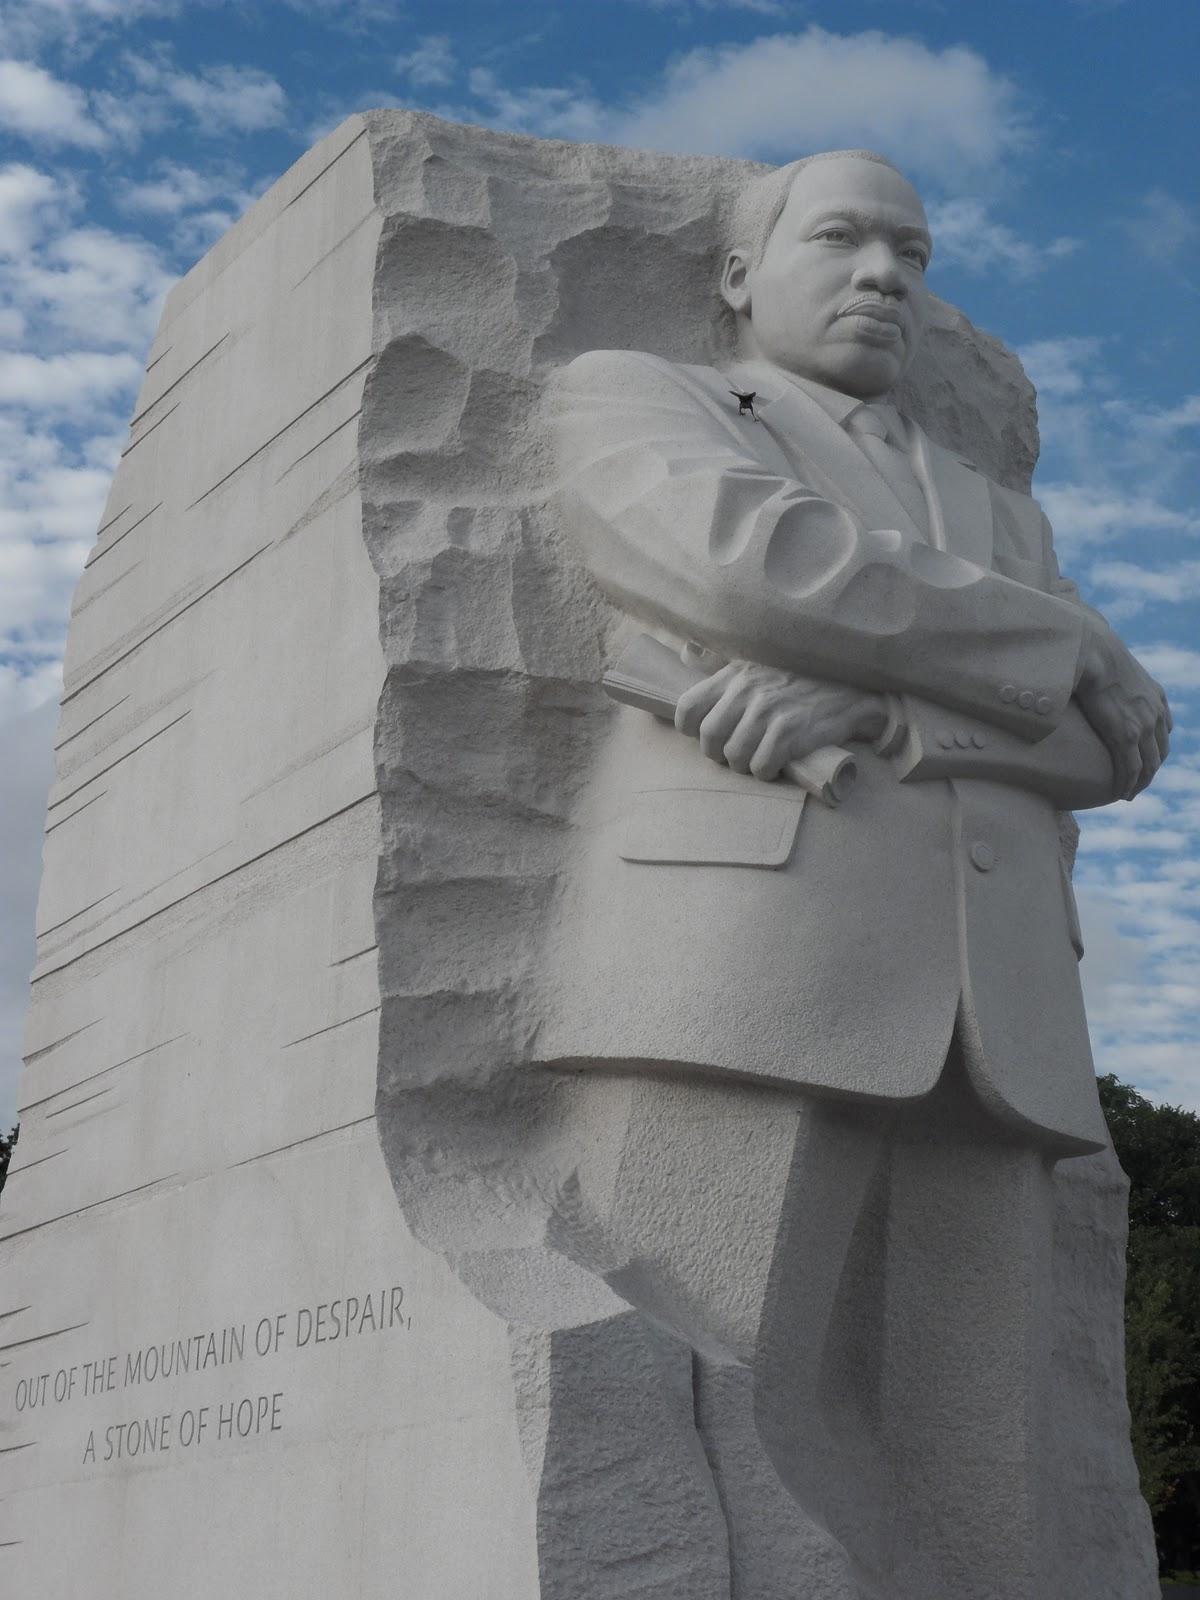 JFK + 50: MARTIN LUTHER KING, JR. MEMORIAL DEDICATED